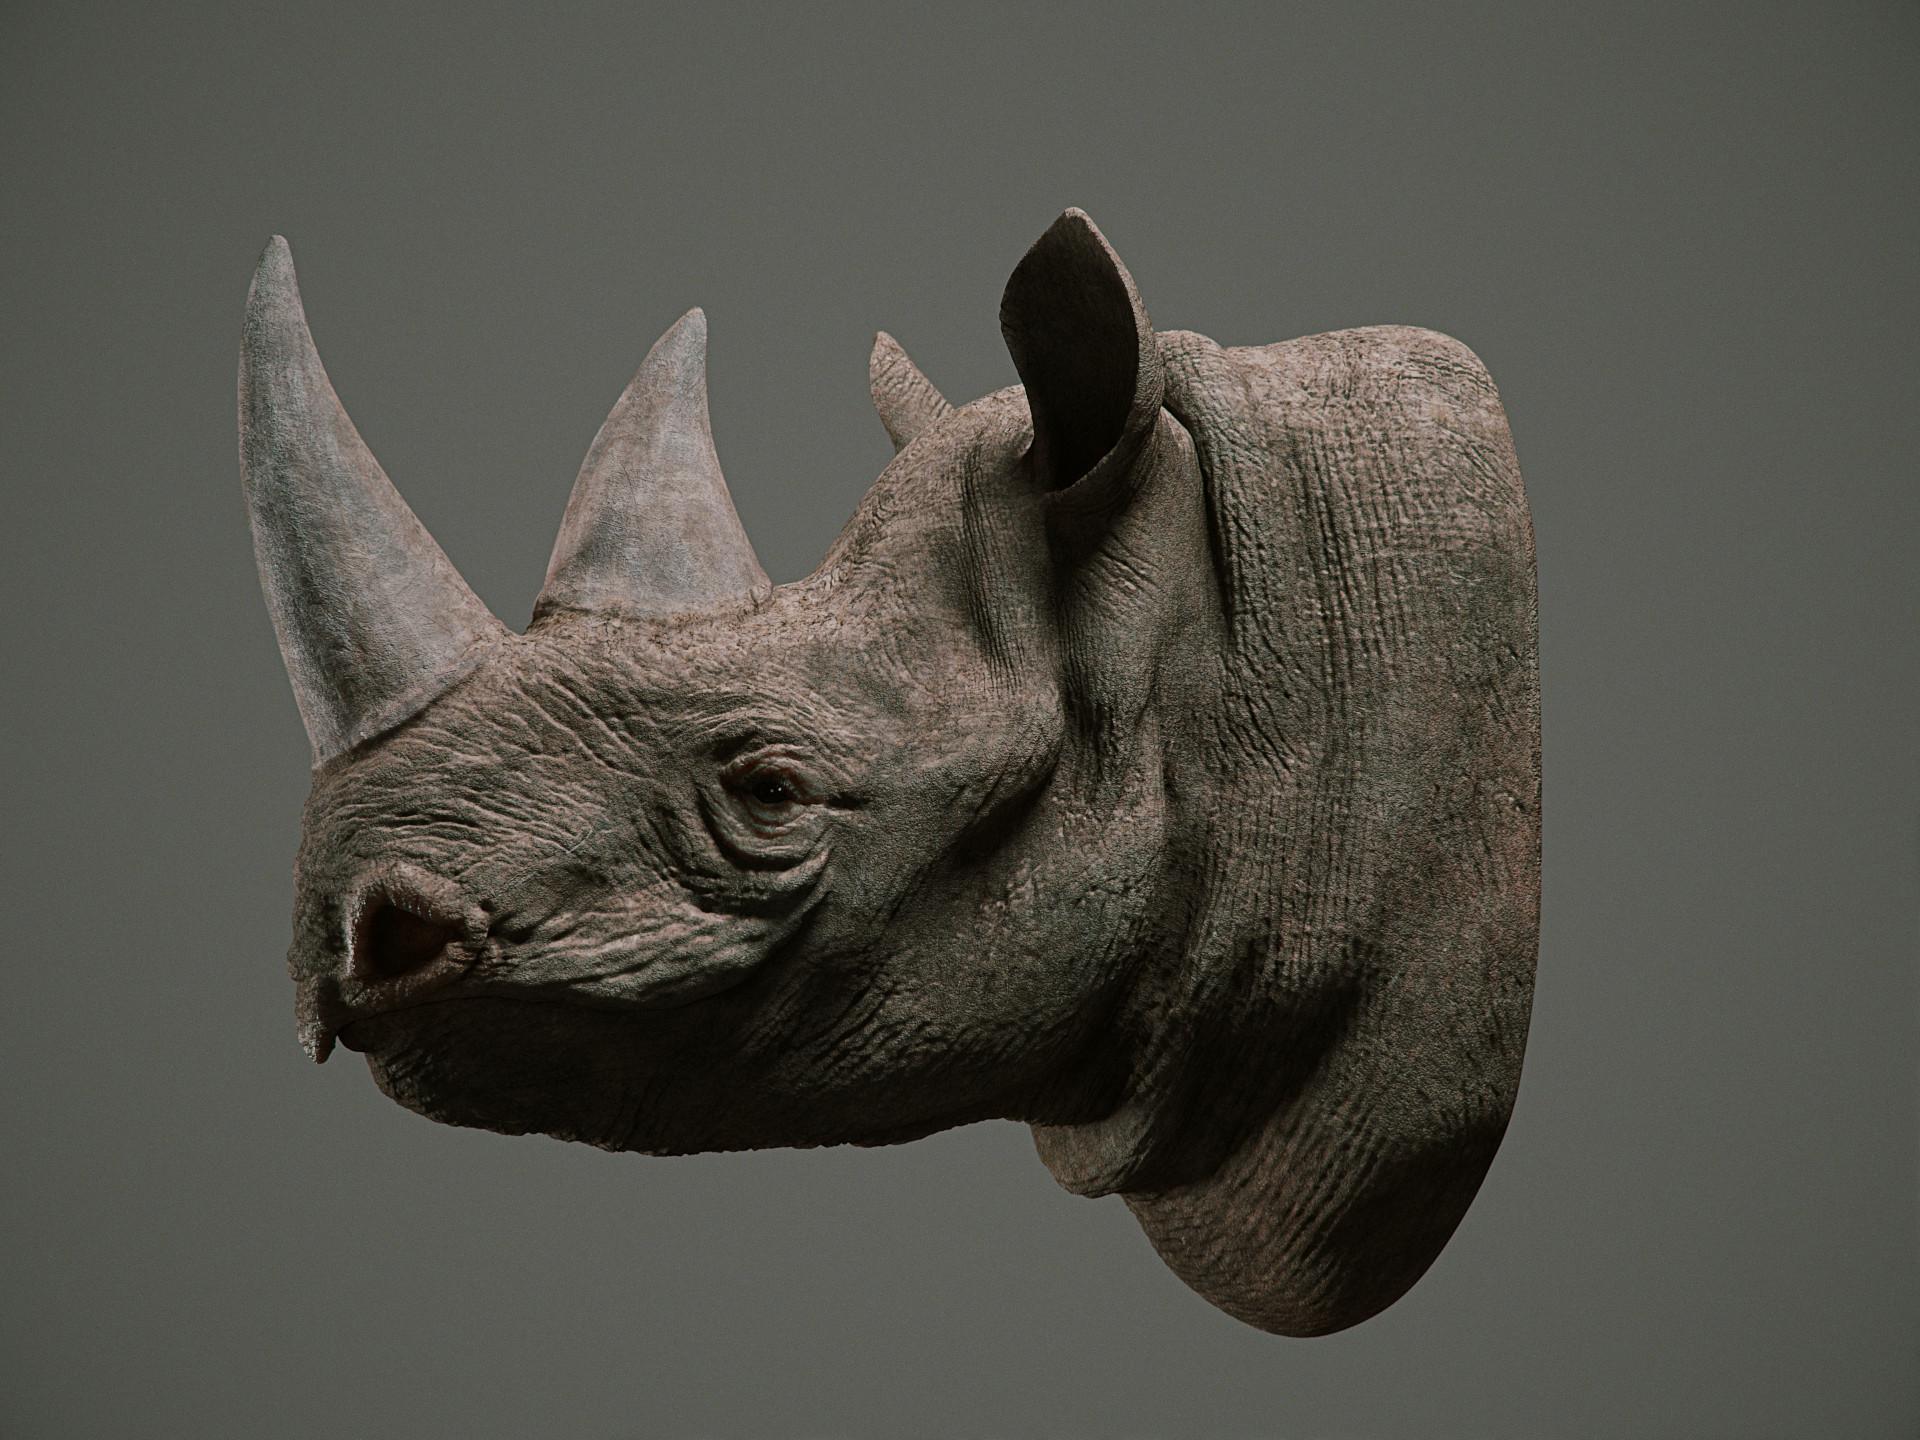 Cgmonkeyking rhino pn01 pp 0002